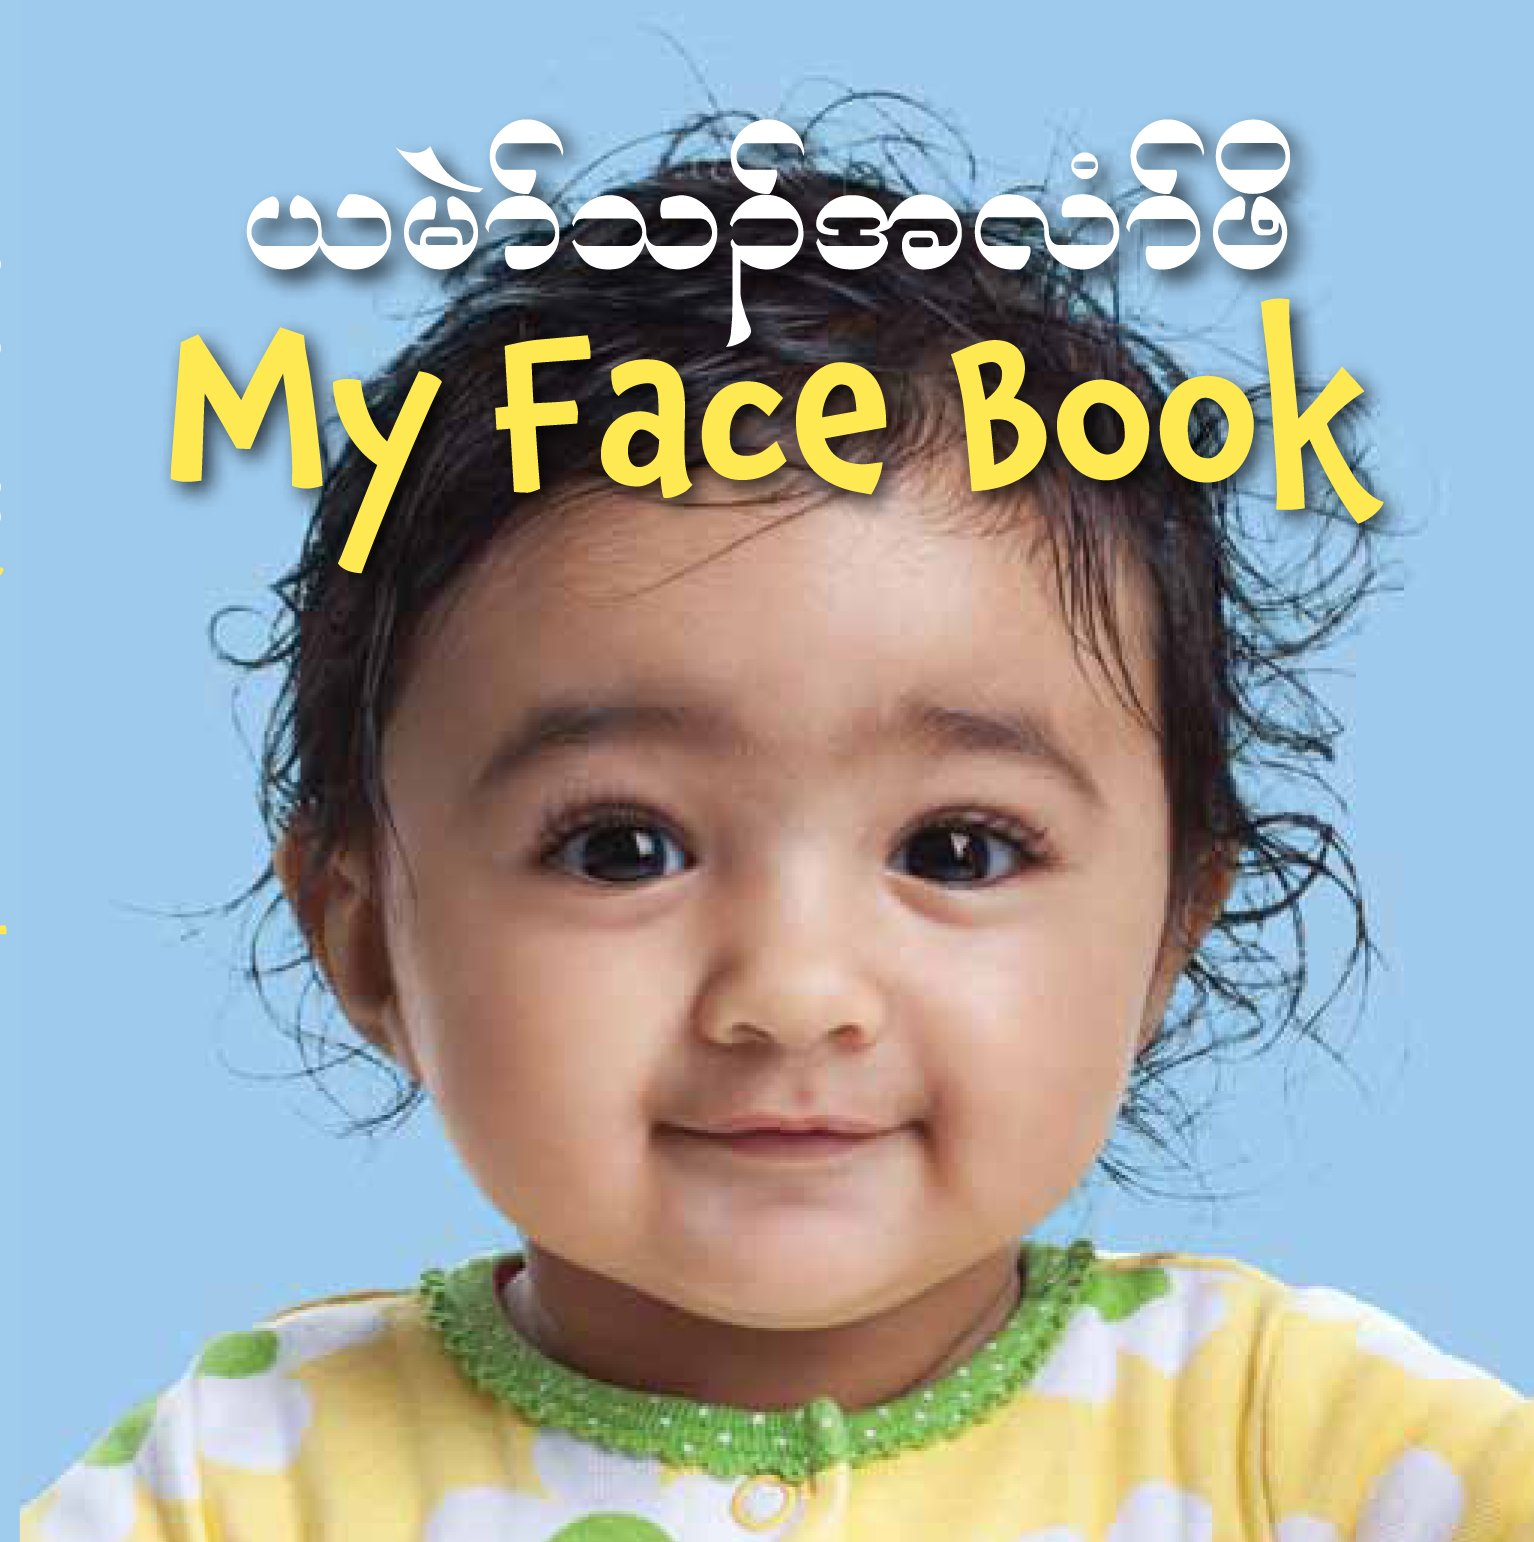 Download My Face Book (Burmese Karen/English) (Burmese and English Edition) ePub fb2 ebook